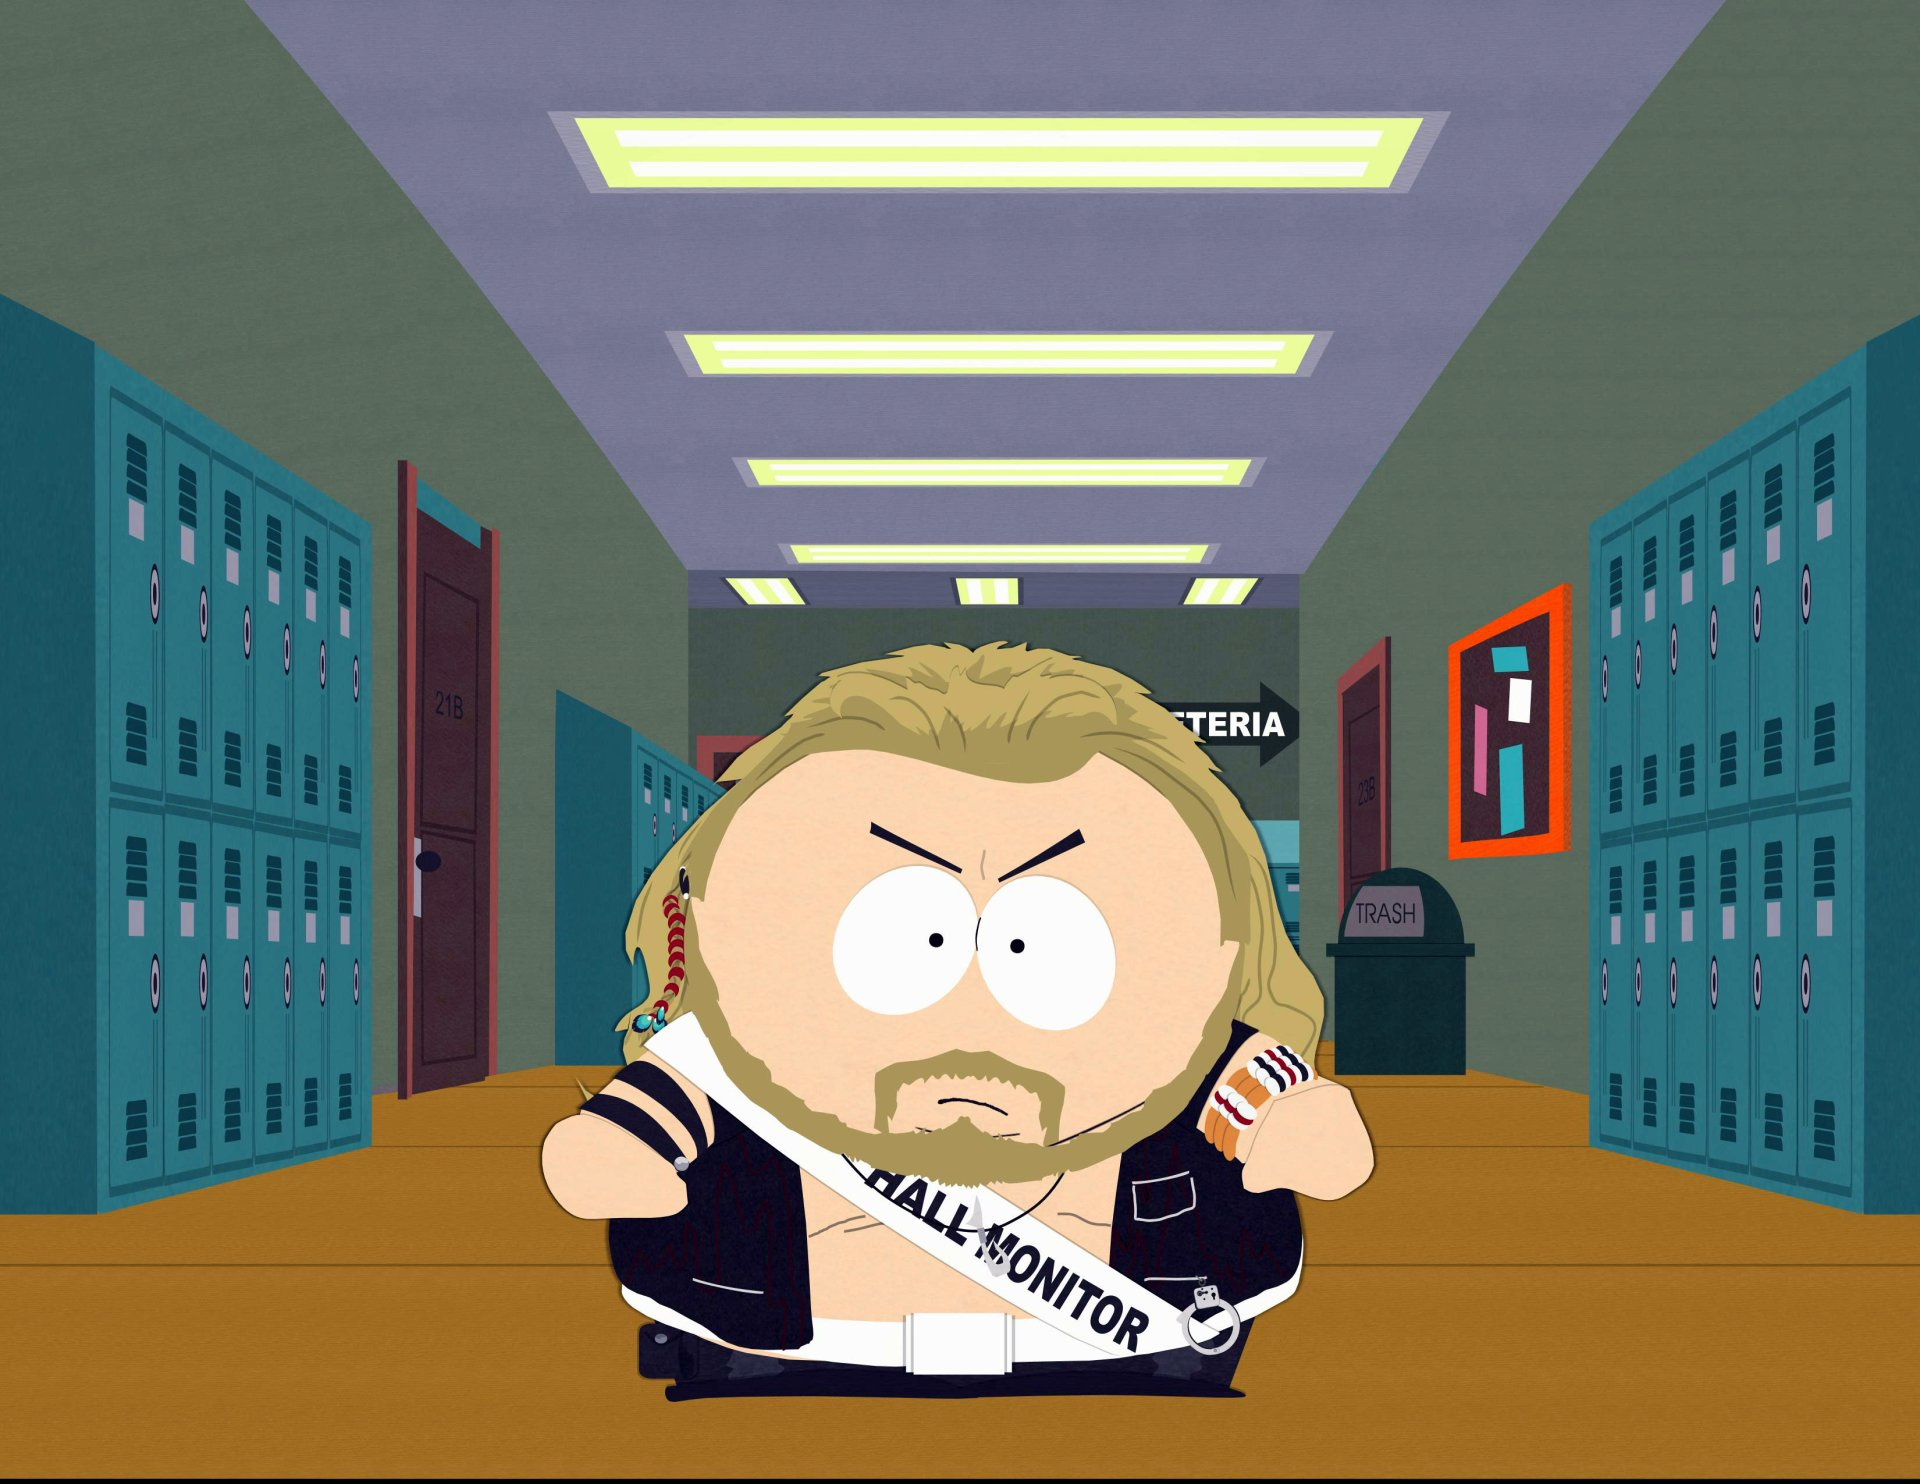 Programma Televisivo - South Park  Eric Cartman Sfondo